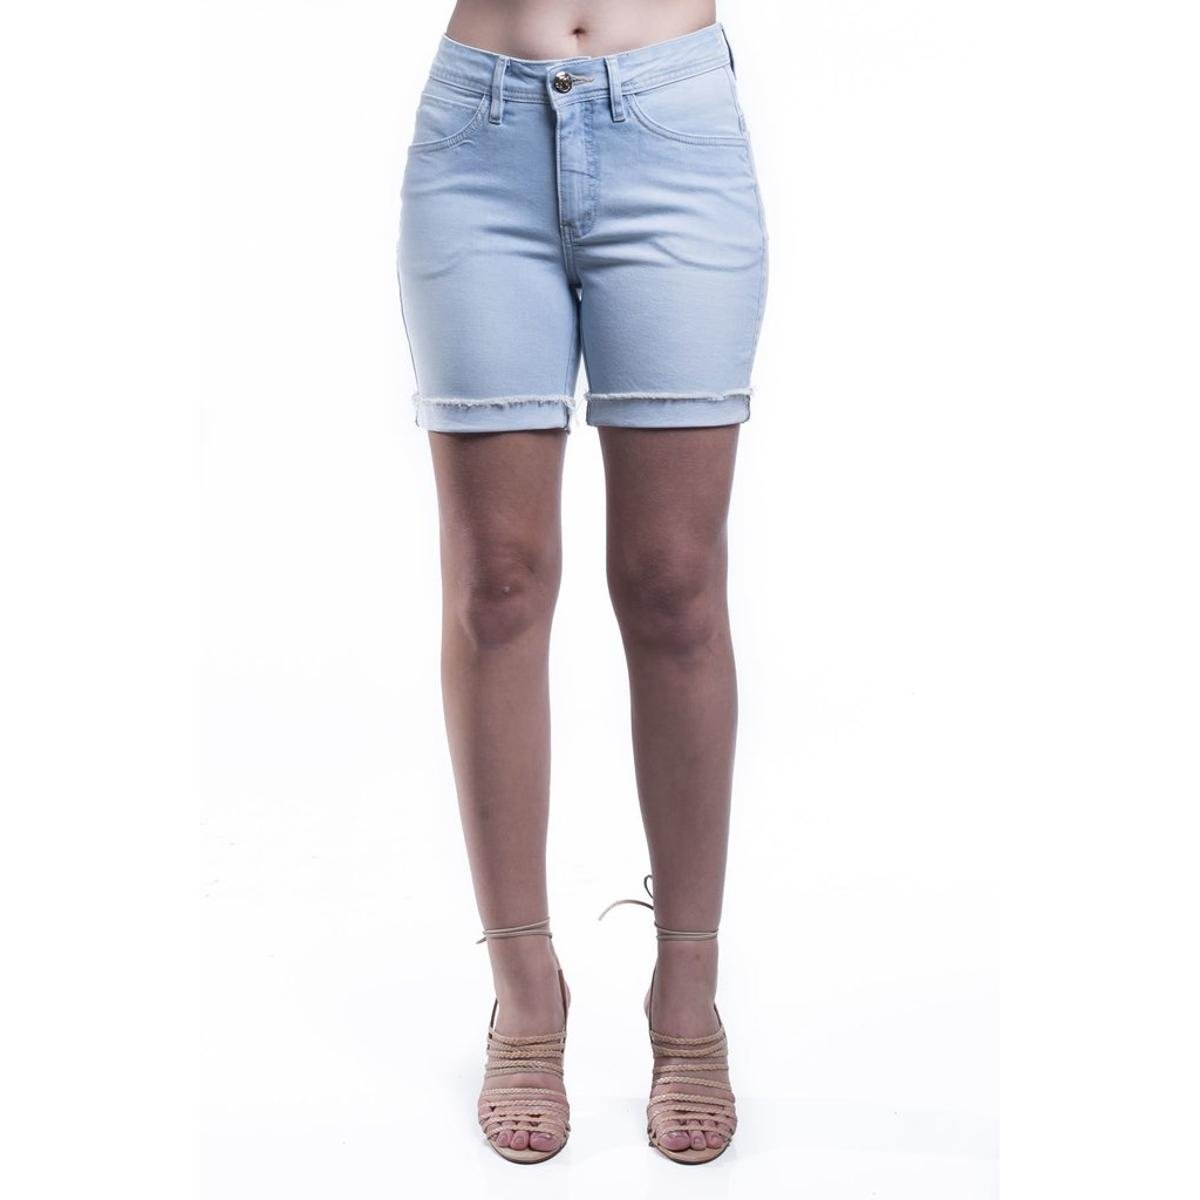 658ec0947 Short Jeans Osmoze Mid Rise Middle Feminino - Compre Agora